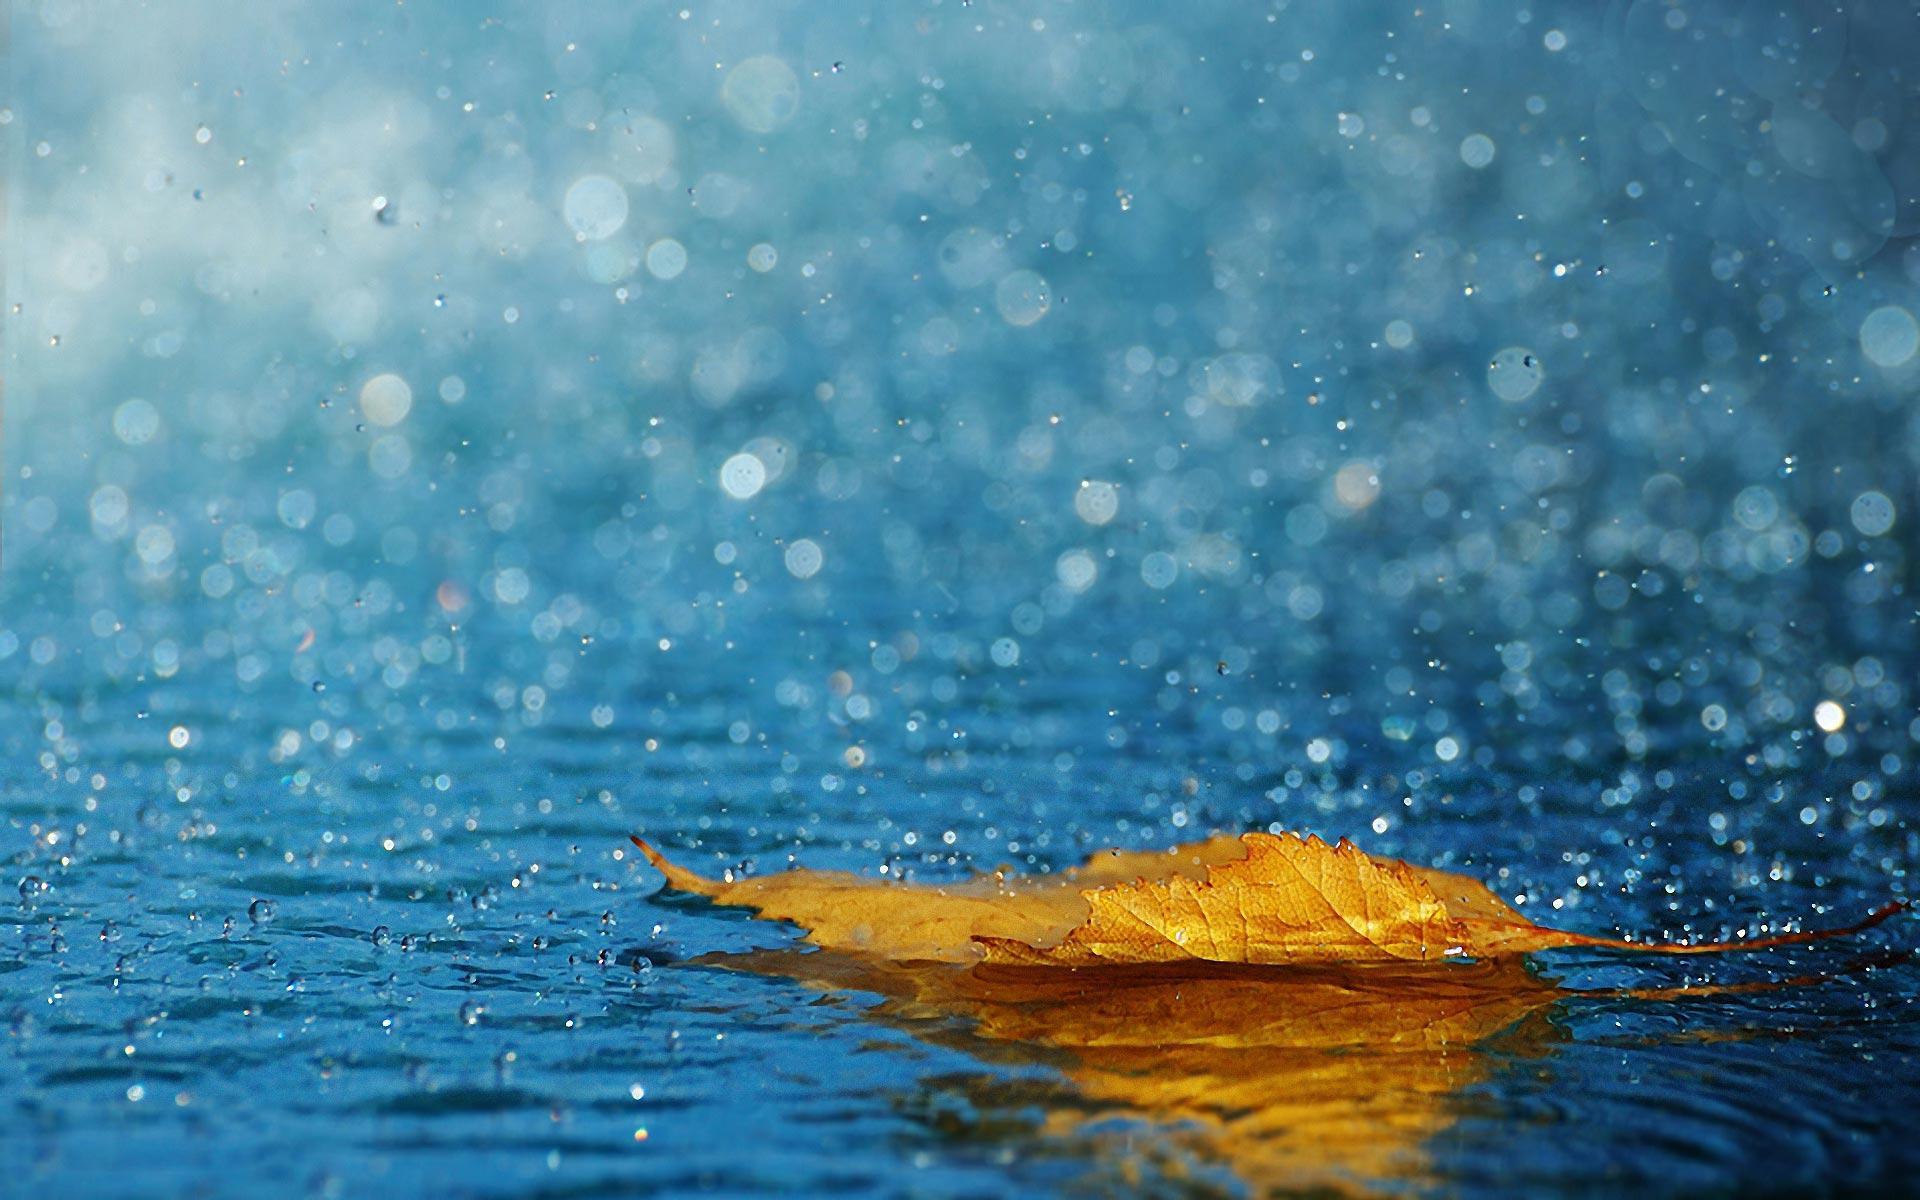 Rain-Wallpaper-HD-Widescreen-4.jpg